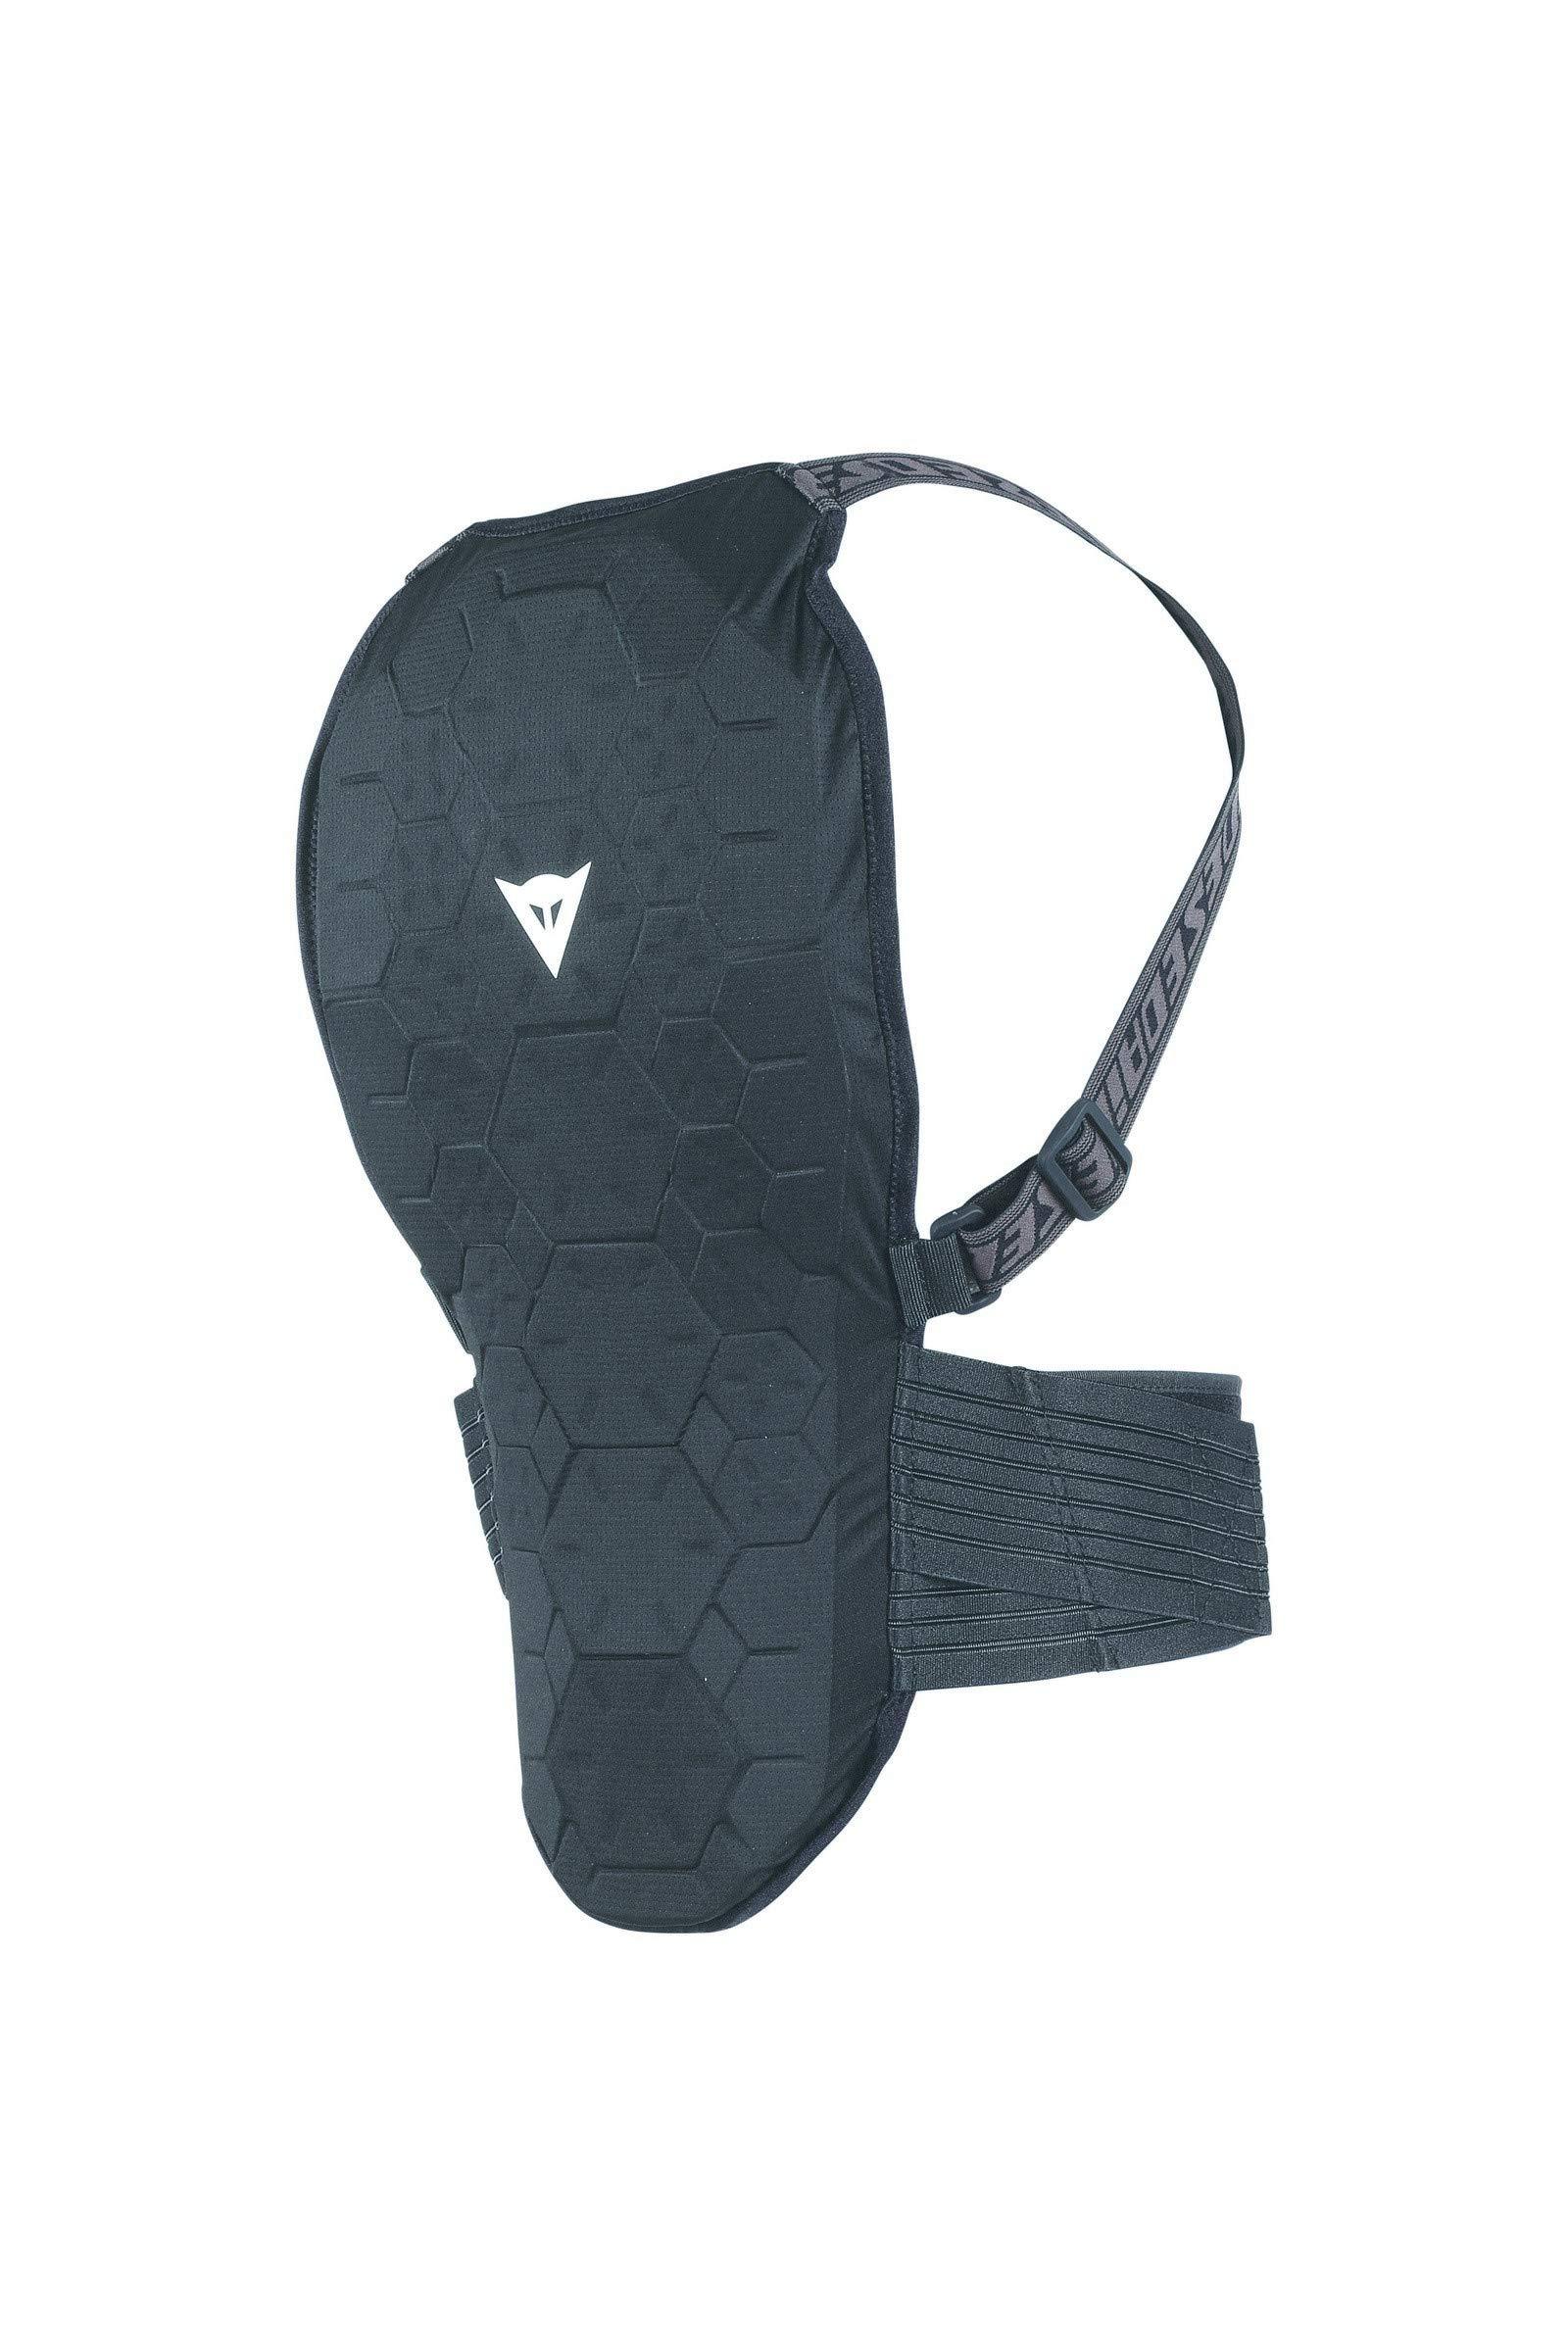 Dainese Kinder Flexagon Ski Back-Protektor, Black/Black, JXL